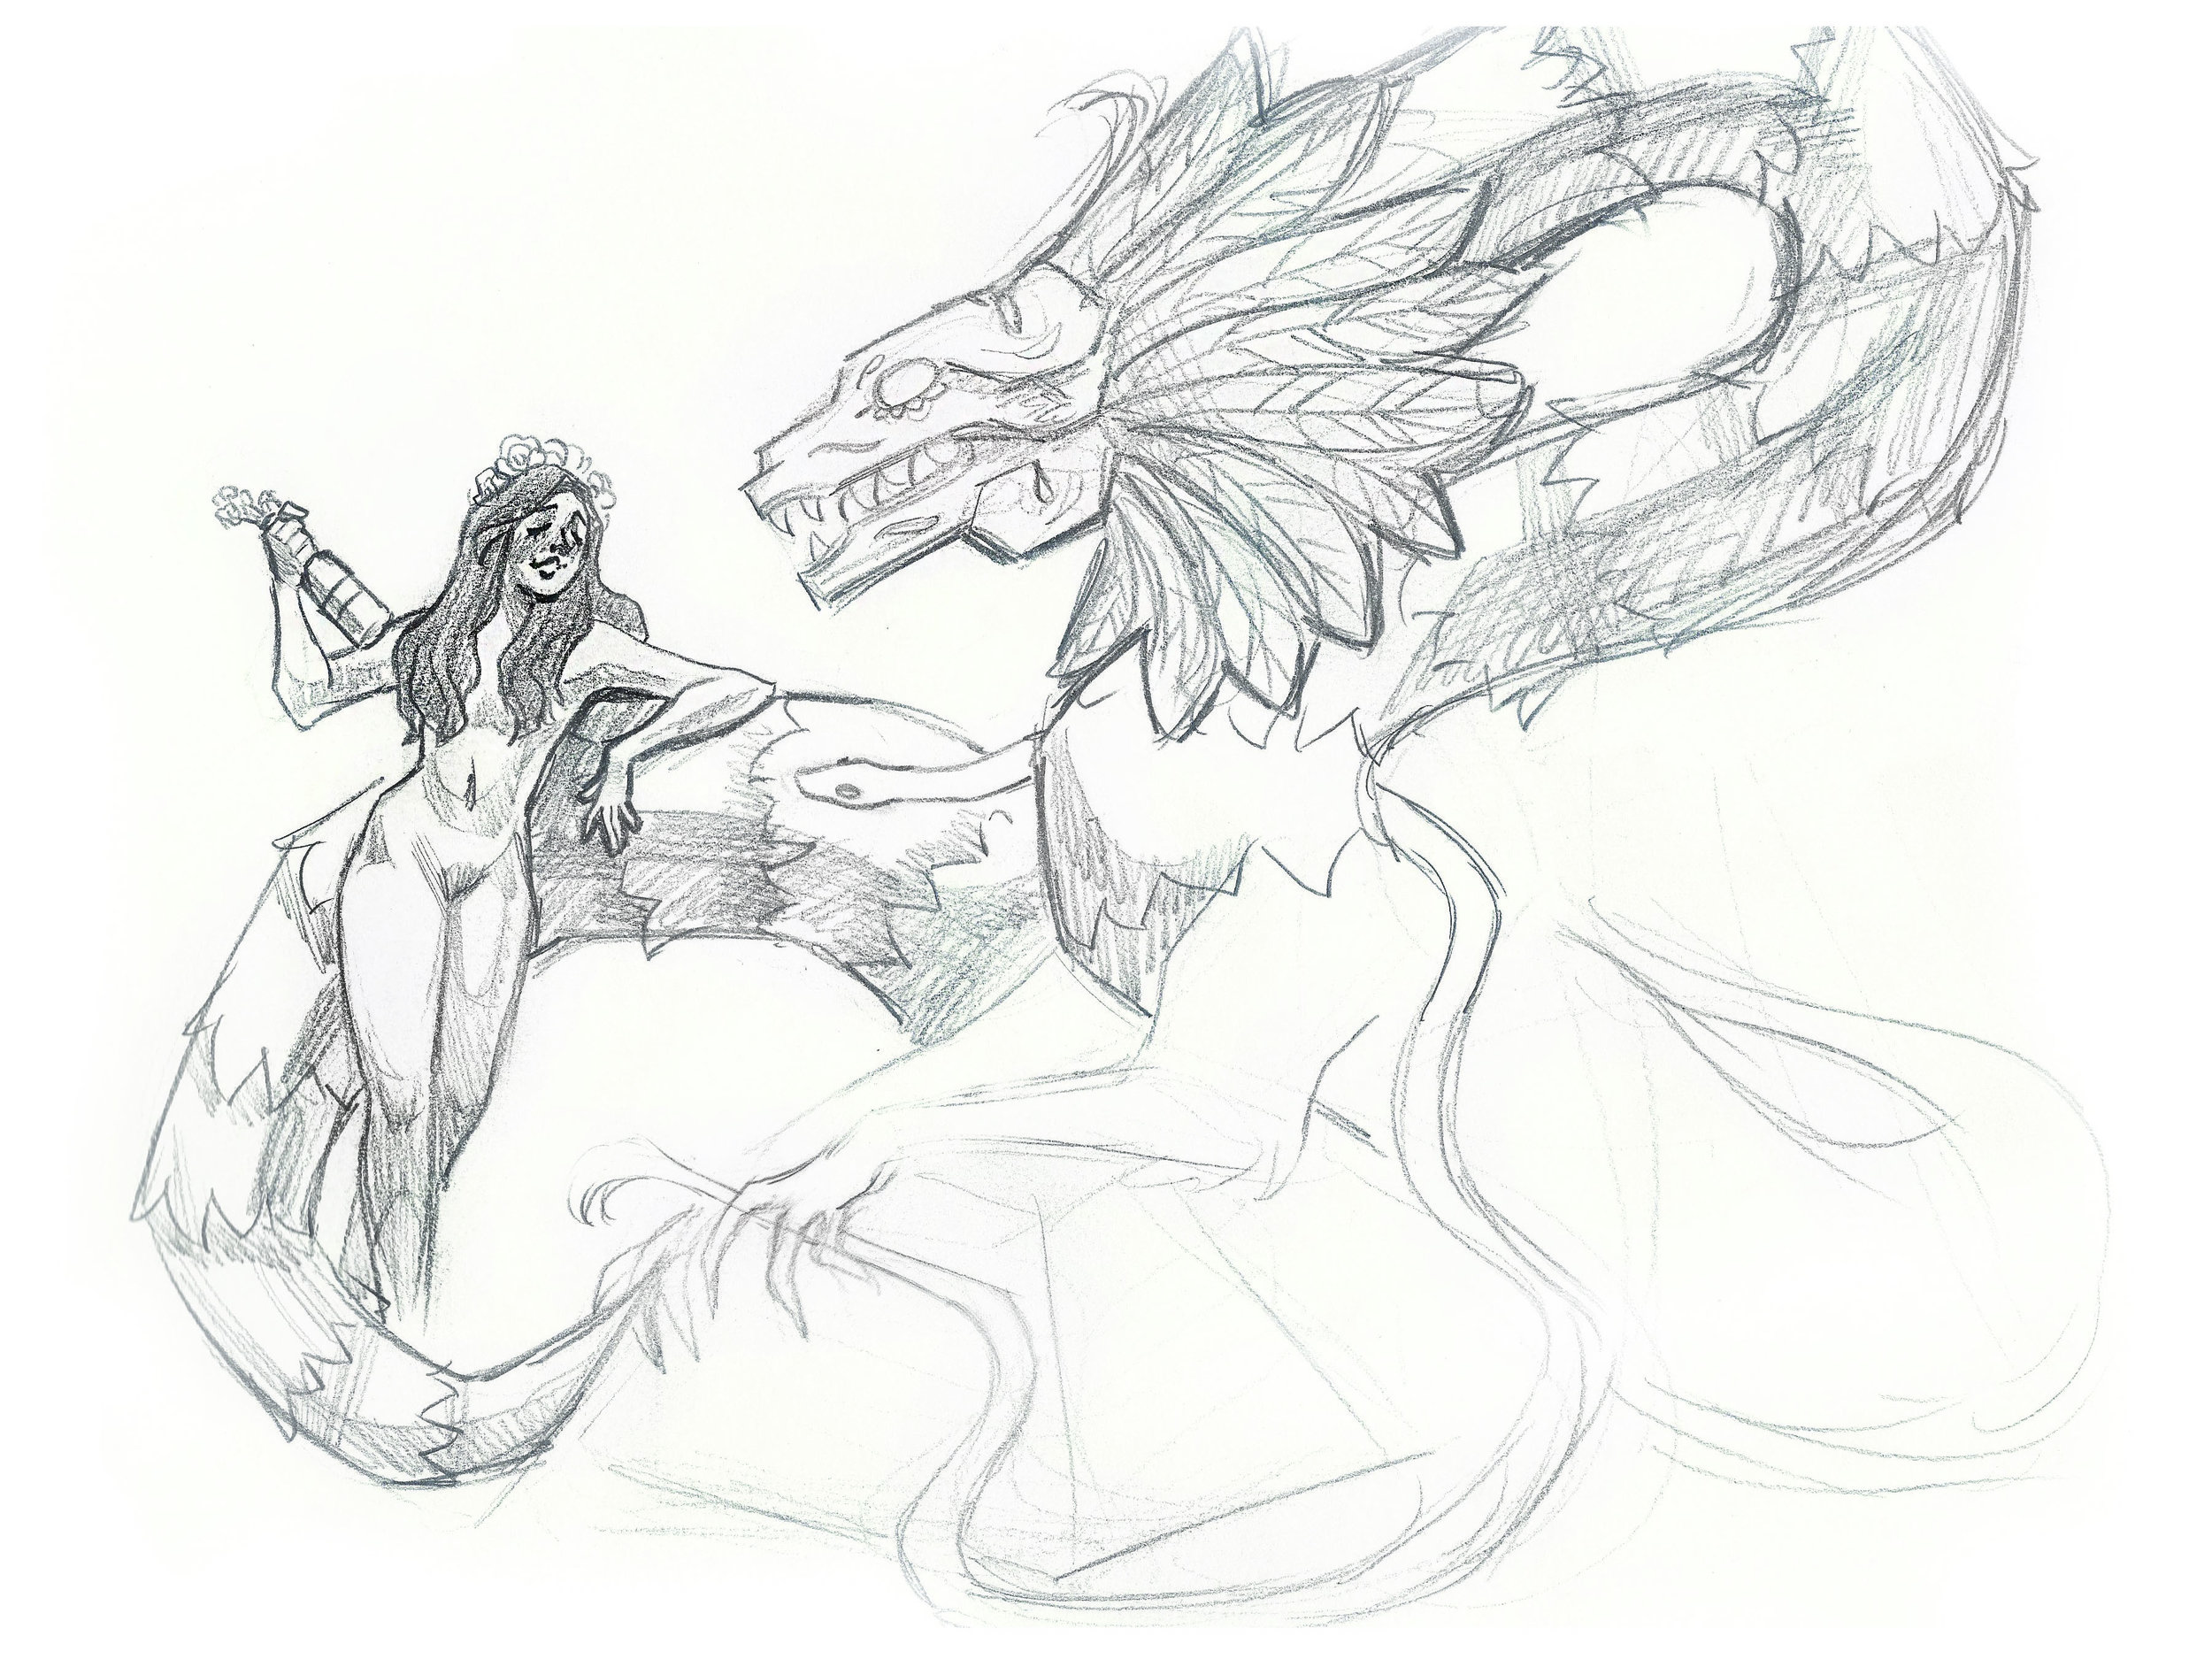 Quetzal_Sketch_3.jpg